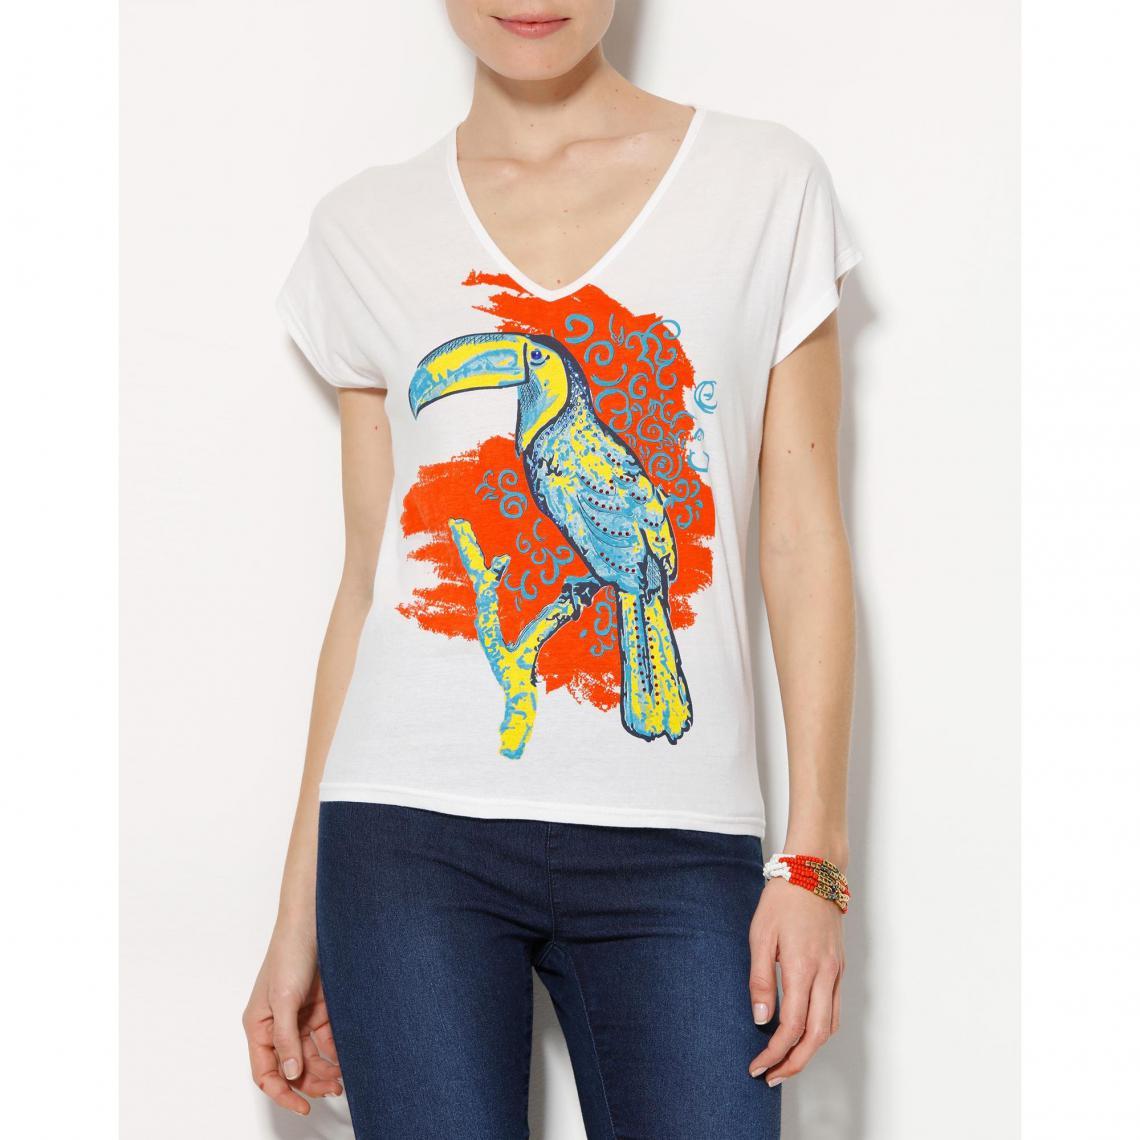 T Suisses Perroquet Femme Blanc3 Shirt Motif 6vY7bfgy